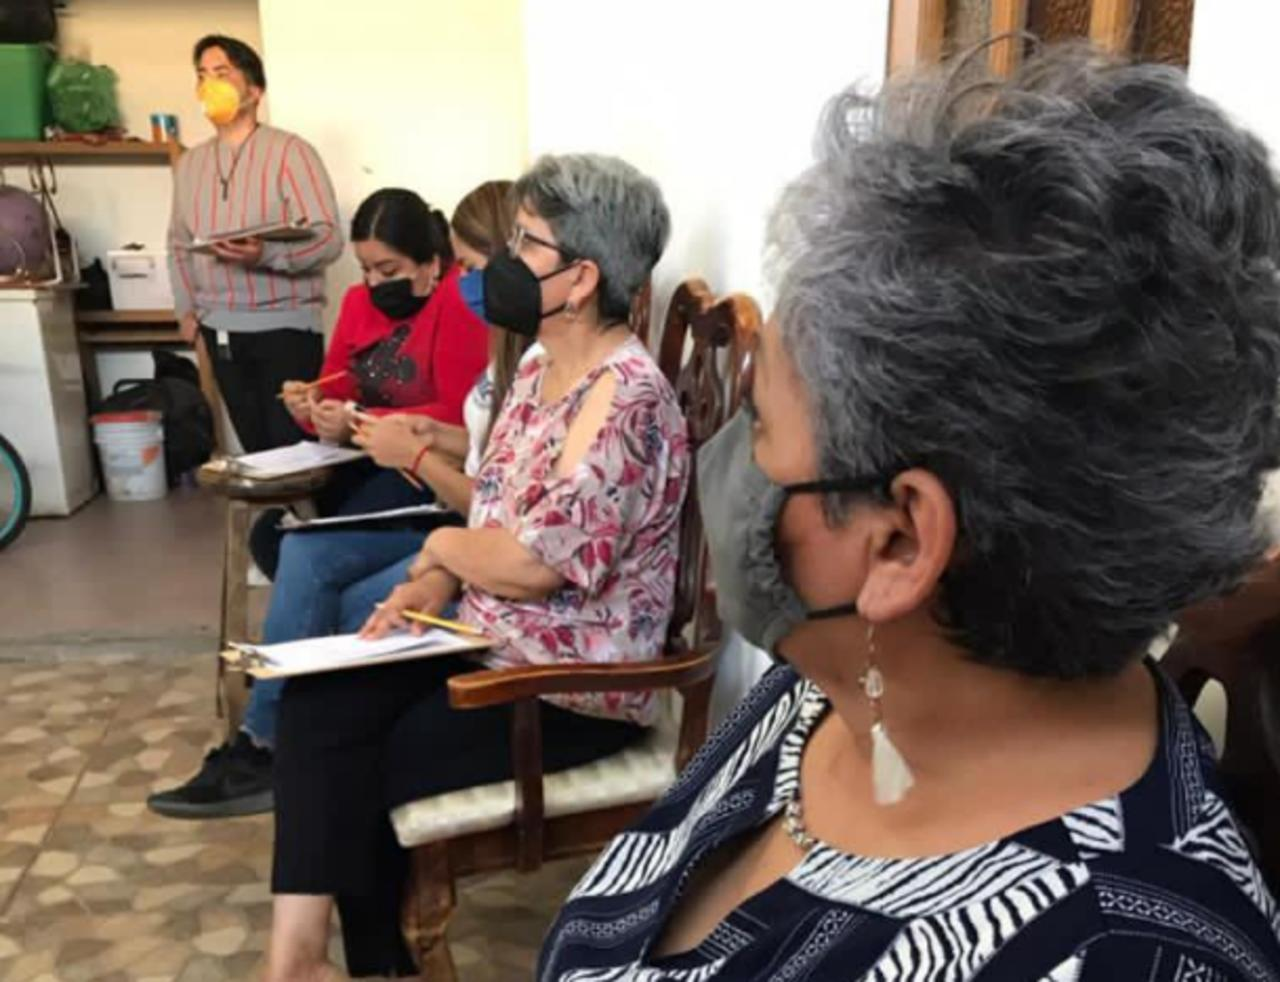 Instituto Municipal de la Familia tendrá nueva titular